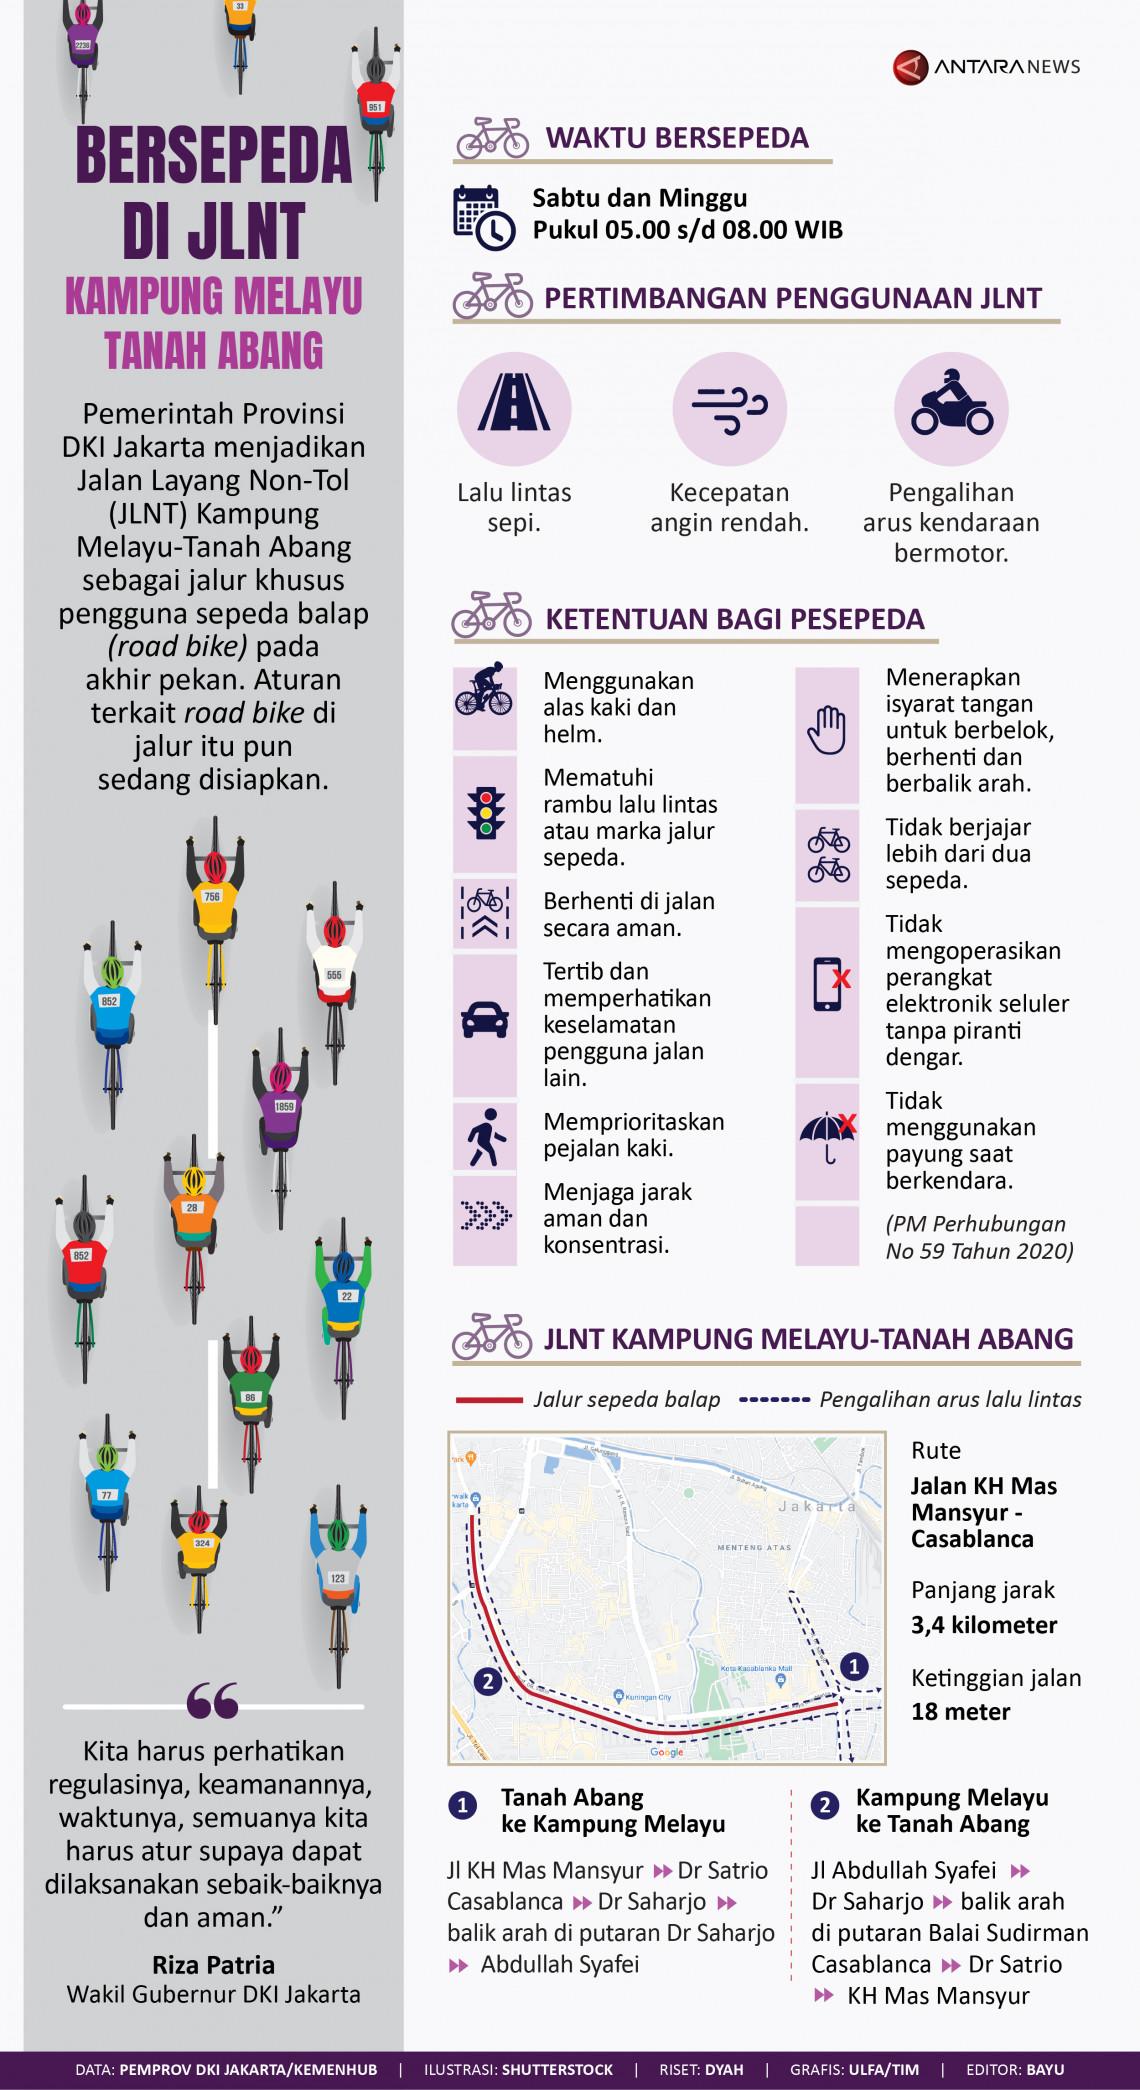 Bersepeda di JLNT Kampung Melayu - Tanah Abang